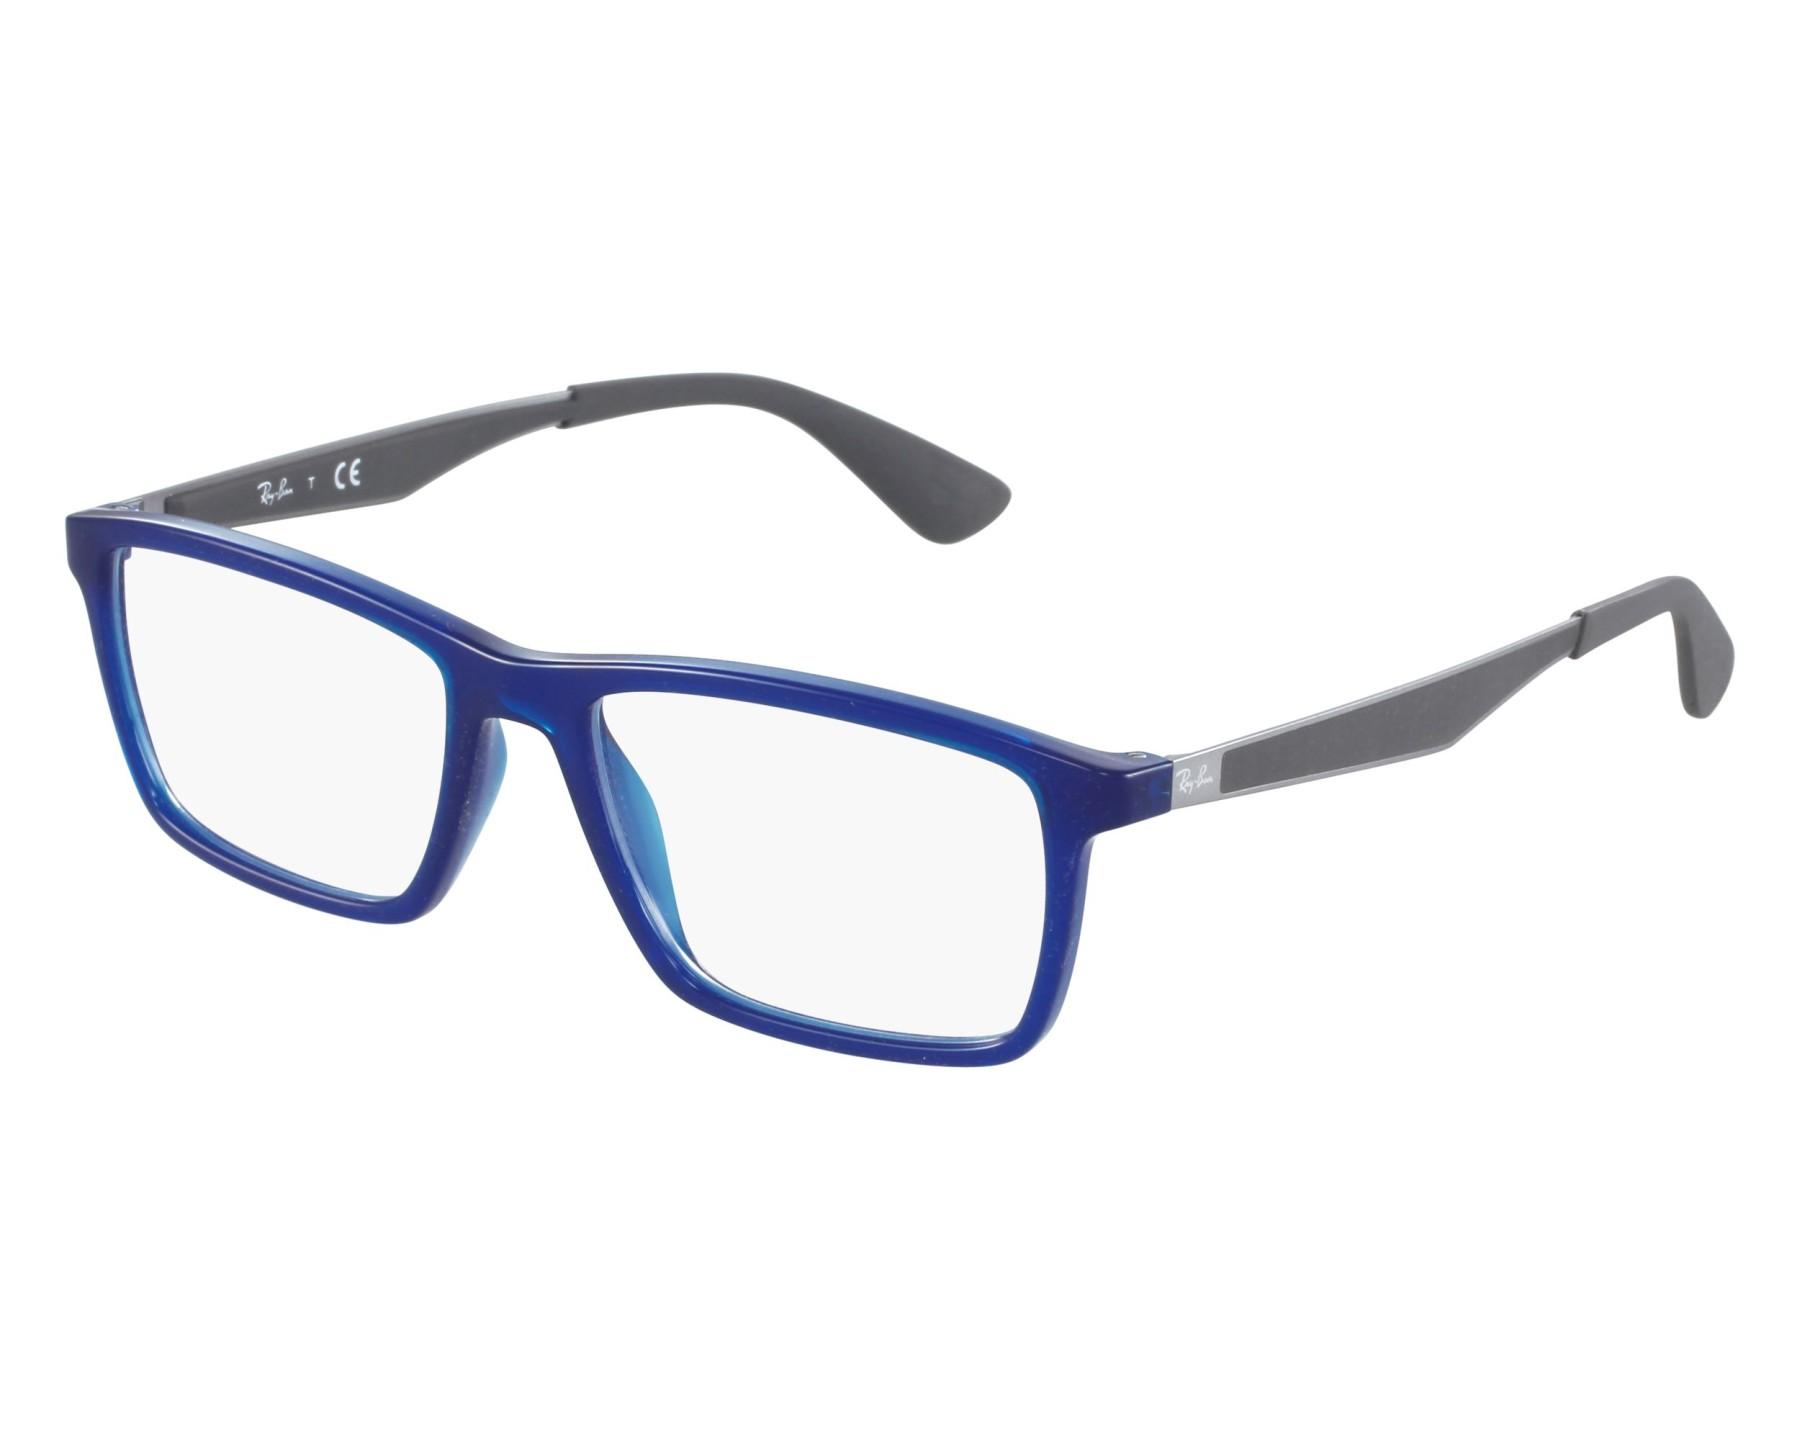 60890cb516 eyeglasses Ray-Ban RX-7056 5393 55-17 Blue Grey front view